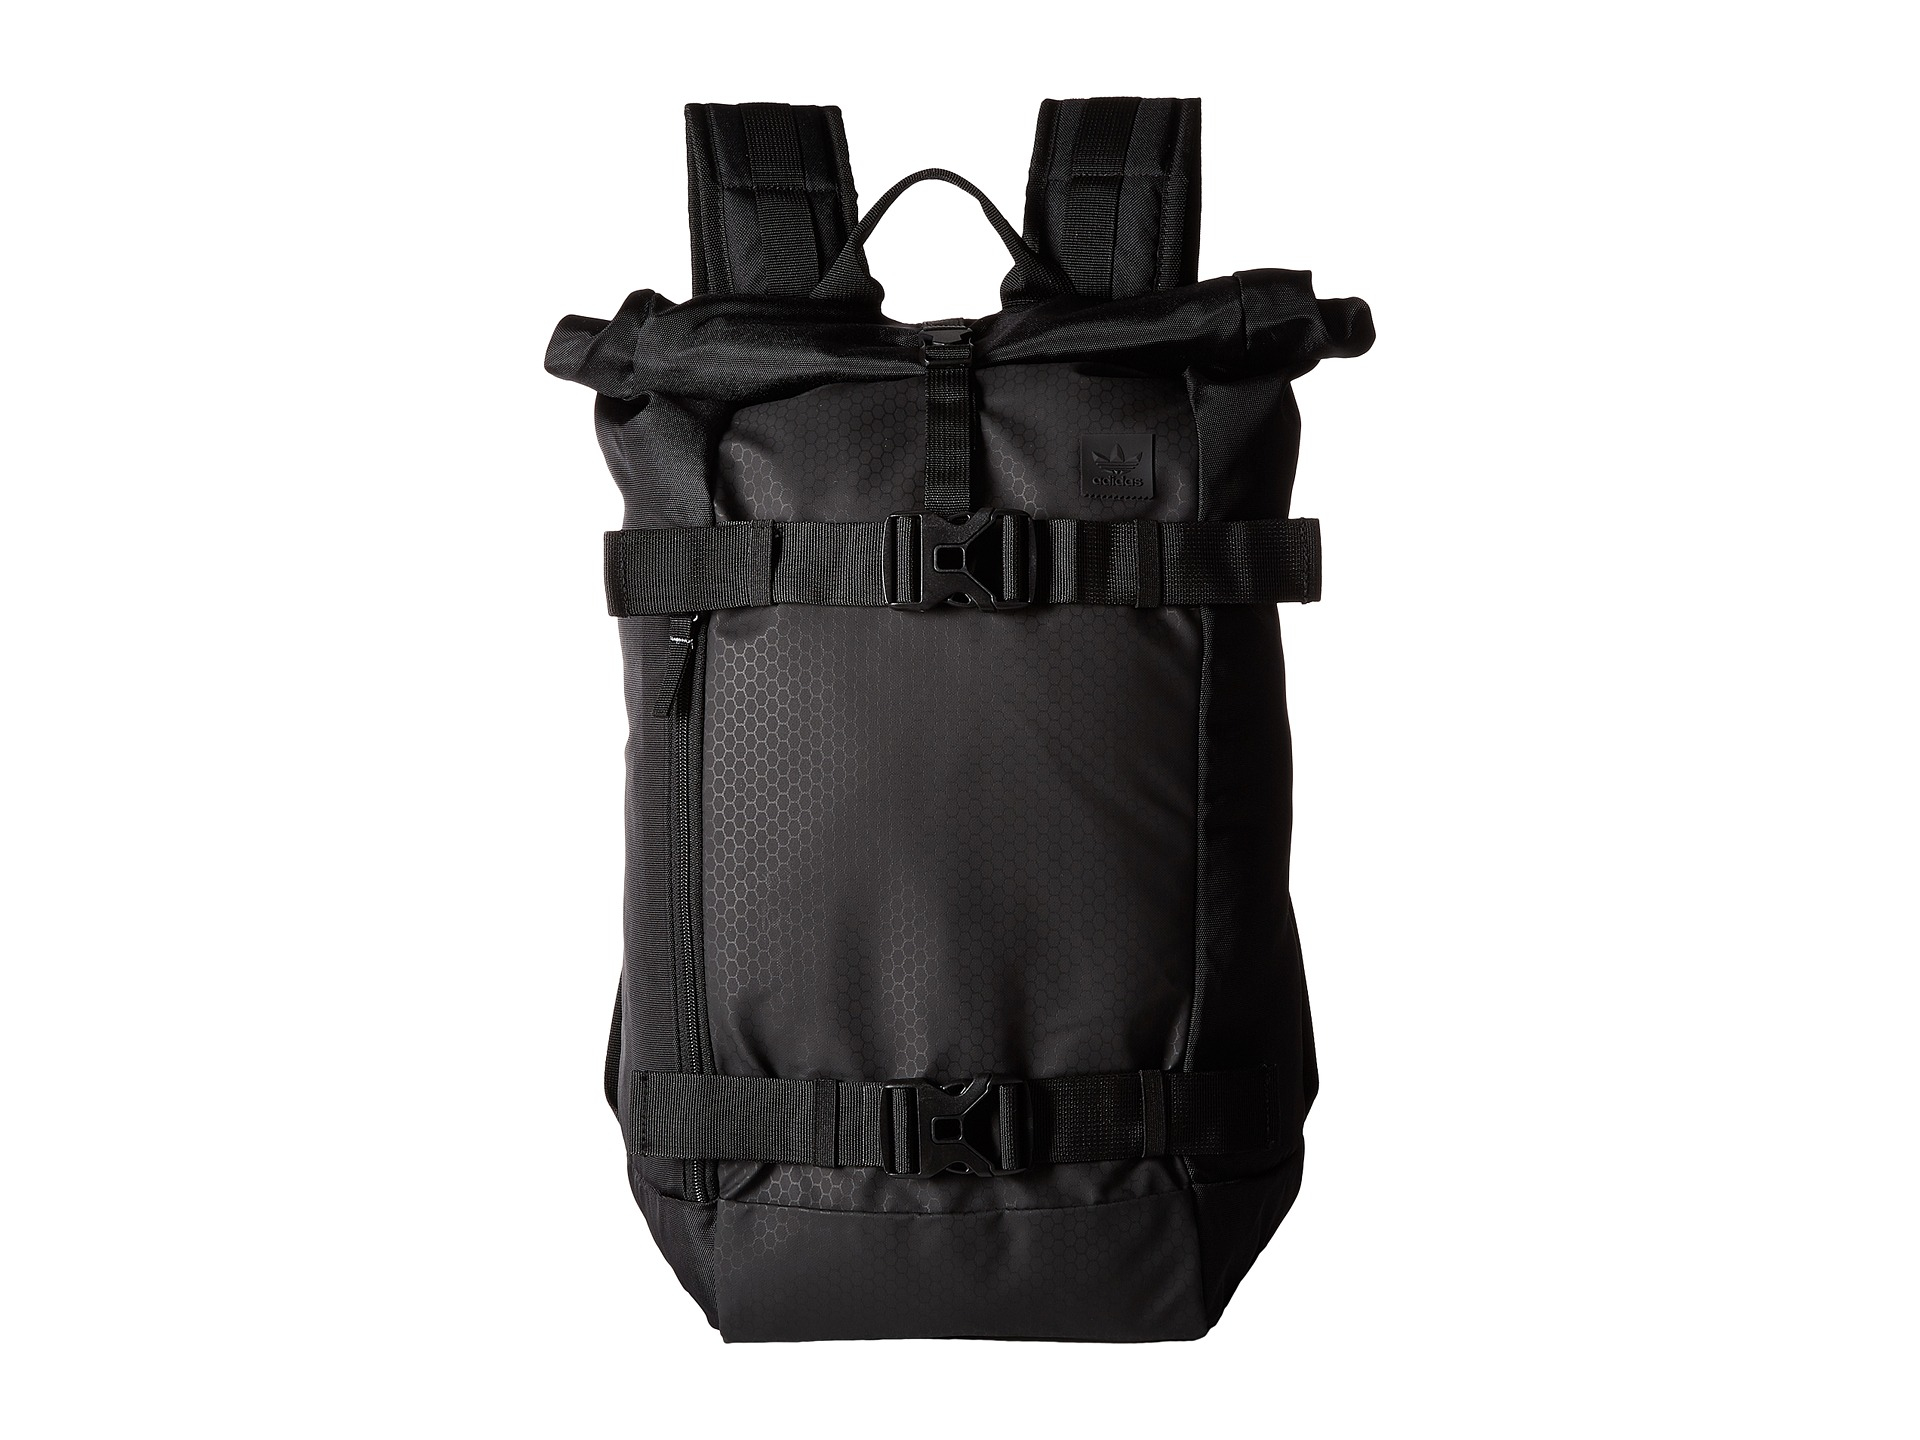 468f1c2498b adidas Originals Originals Action Sports Skate Strap Backpack in ...